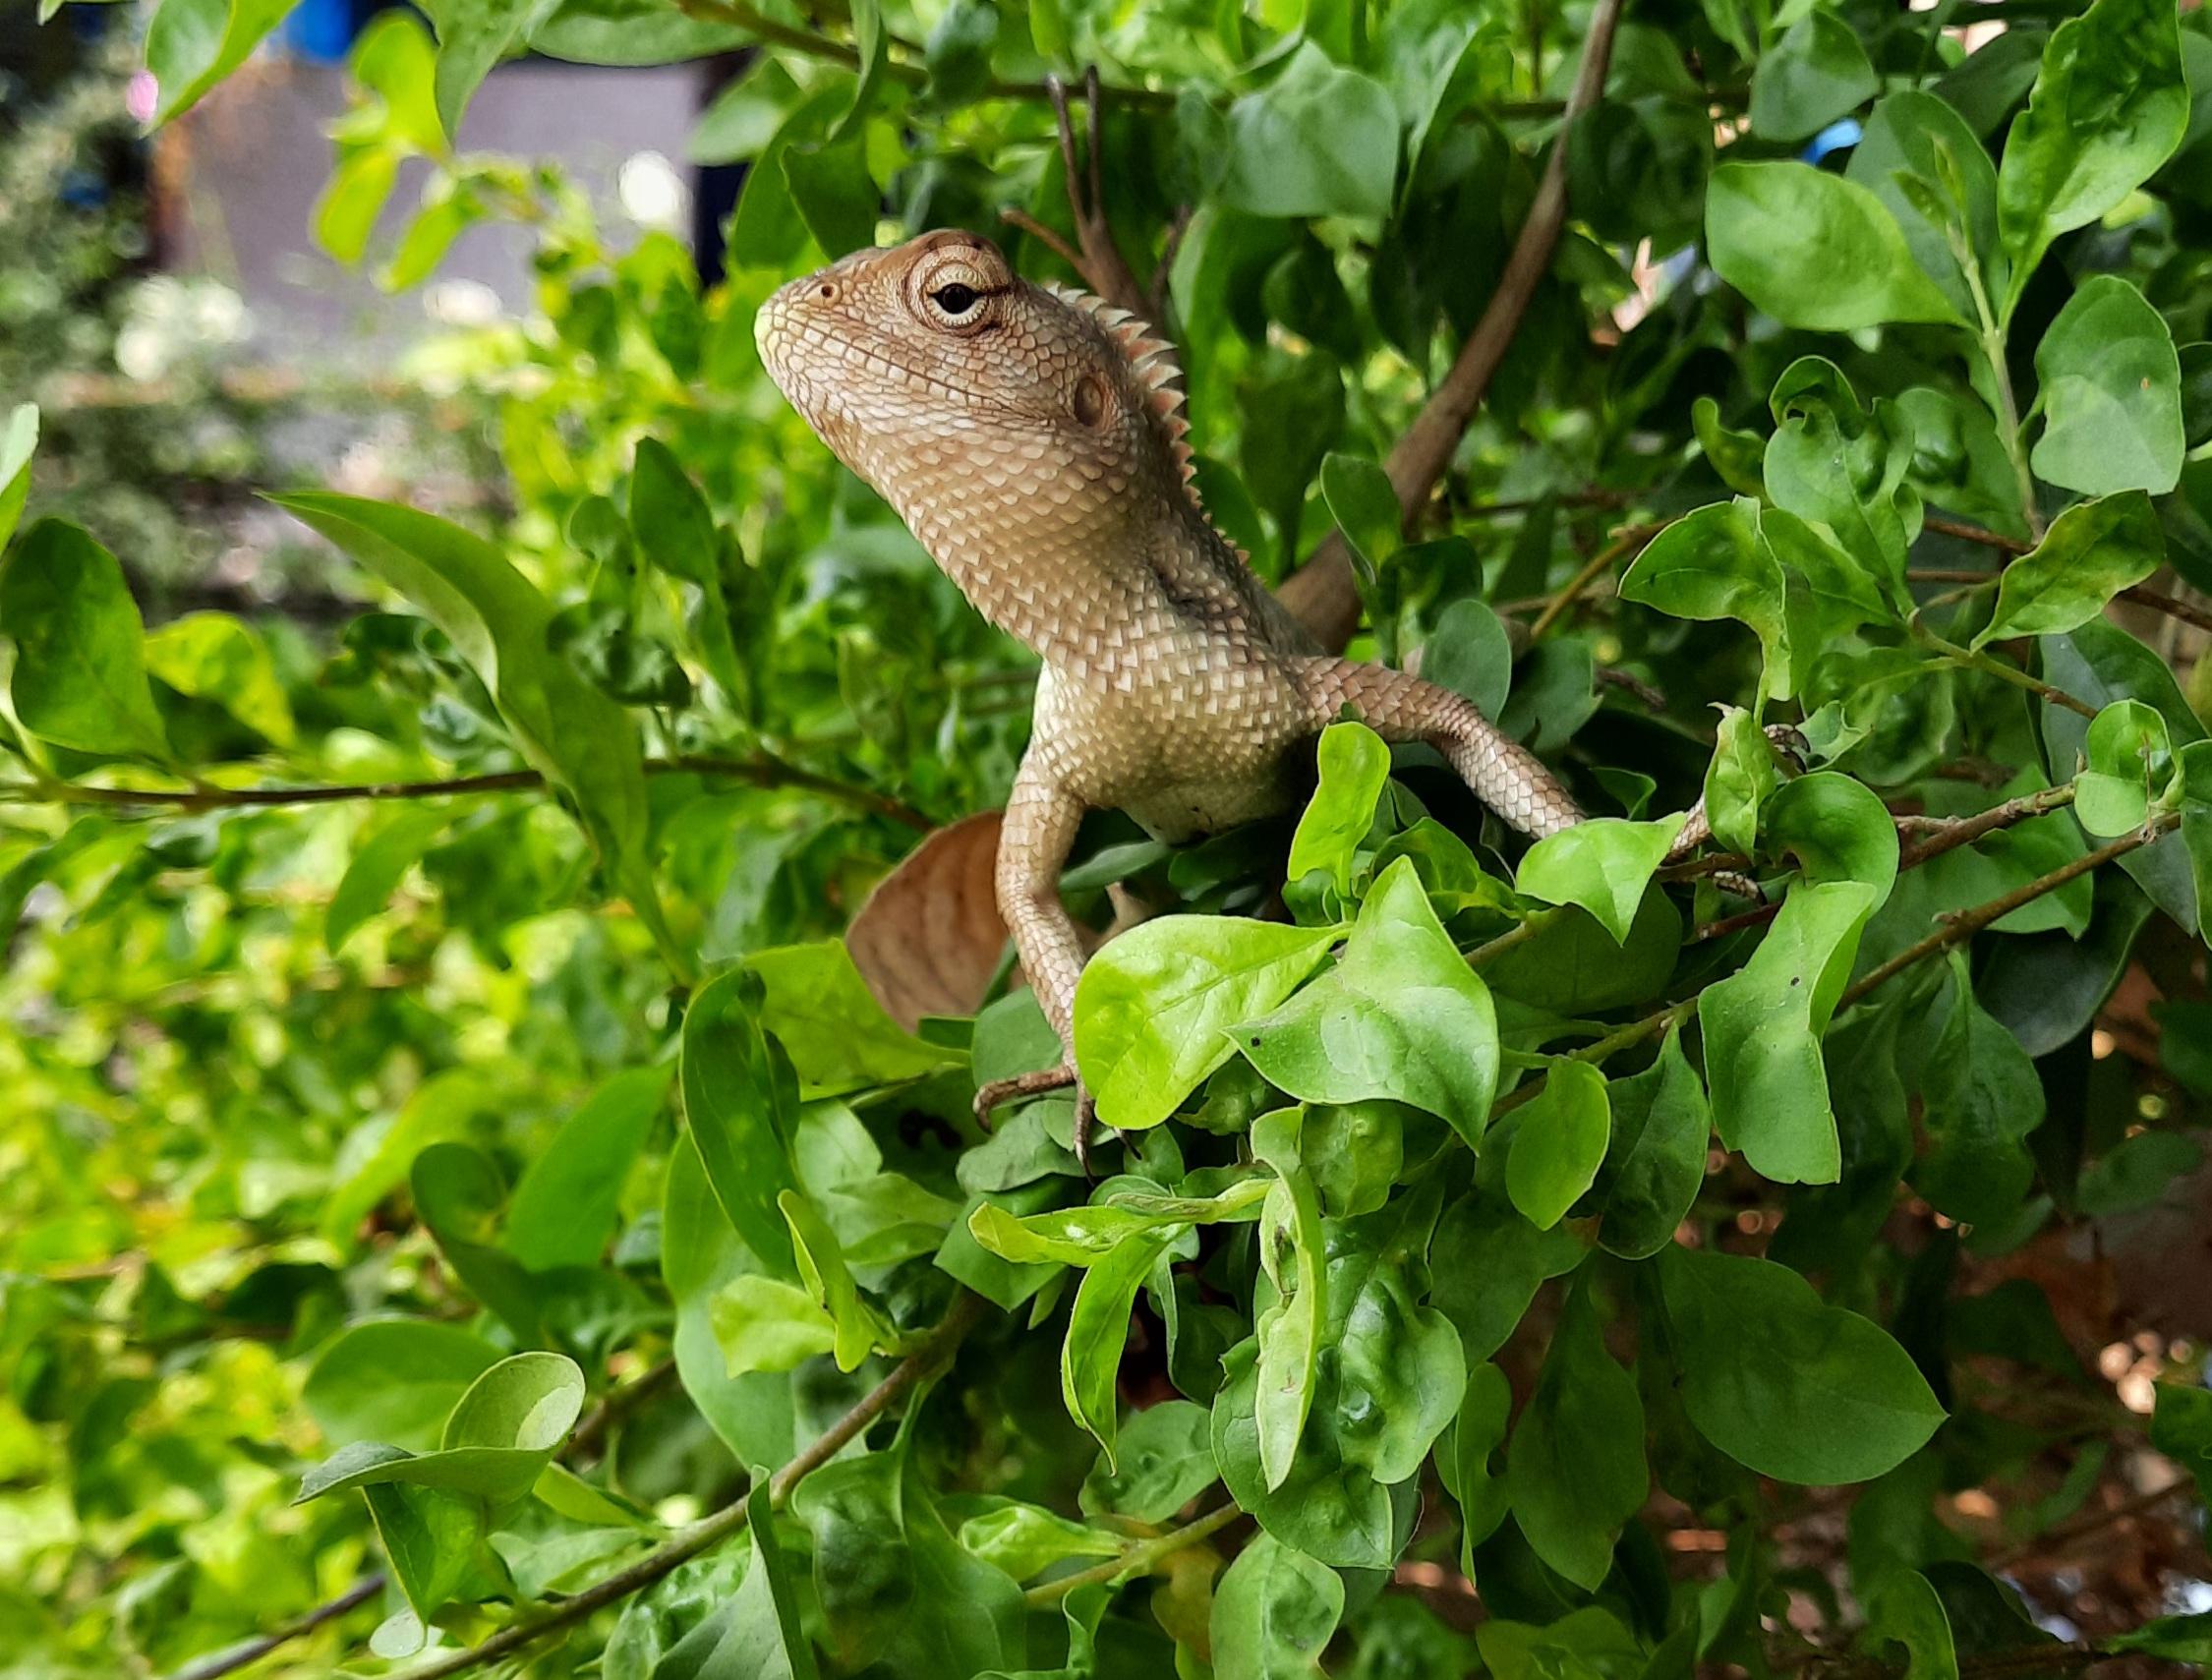 Garden lizard on plant